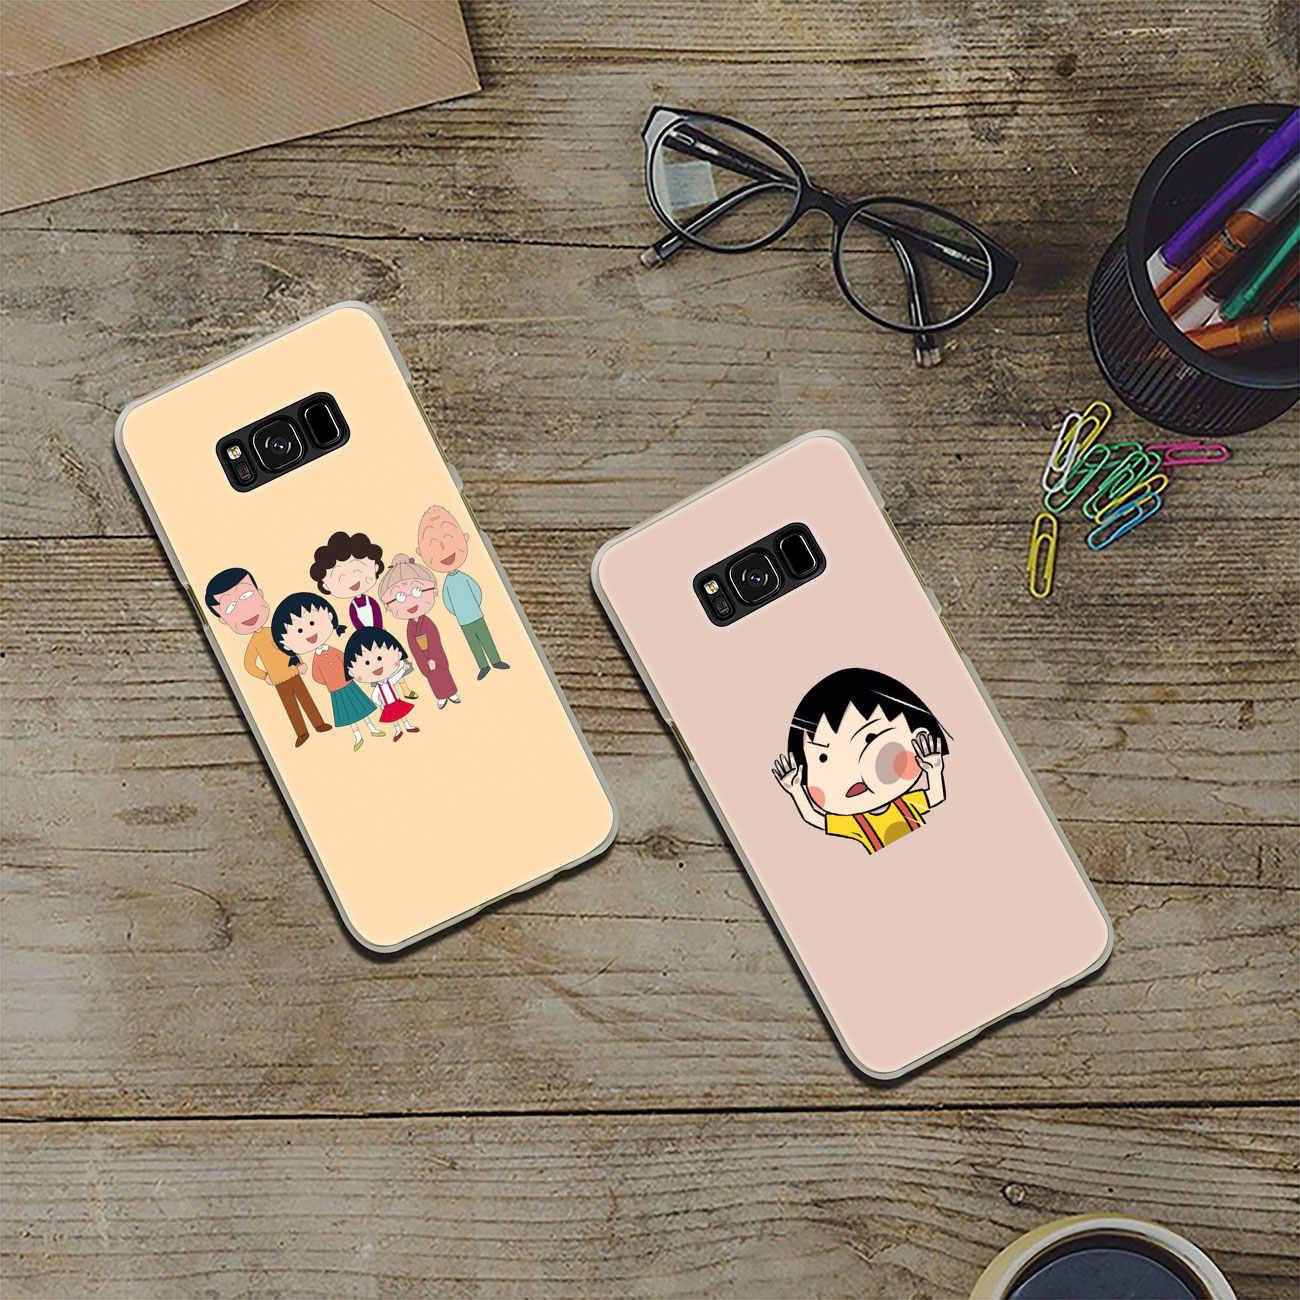 Lavaza Japonya Kız Kiraz chibi maruko chan Sert Şeffaf Telefon samsung kılıfı Galaxy S10 E S10E S8 S9 Artı S6 S7 kenar Kapak